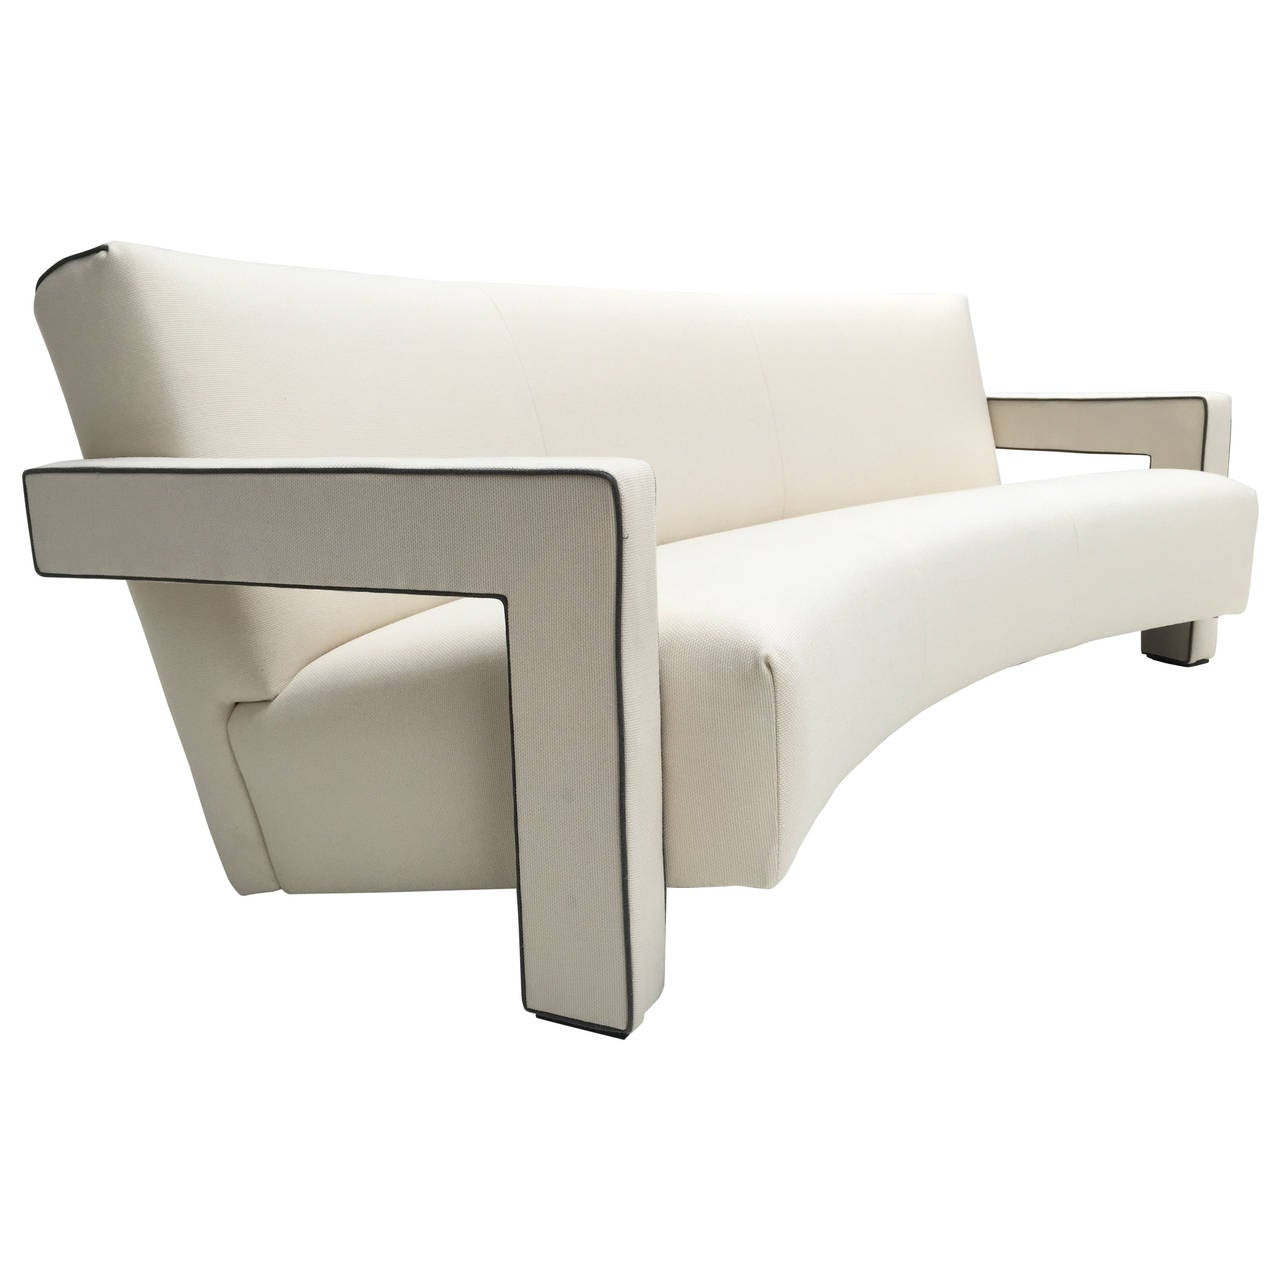 Gerrit rietveld furniture - Stunning De Stijl Gerrit Rietveld Utrecht Sofa Cassina